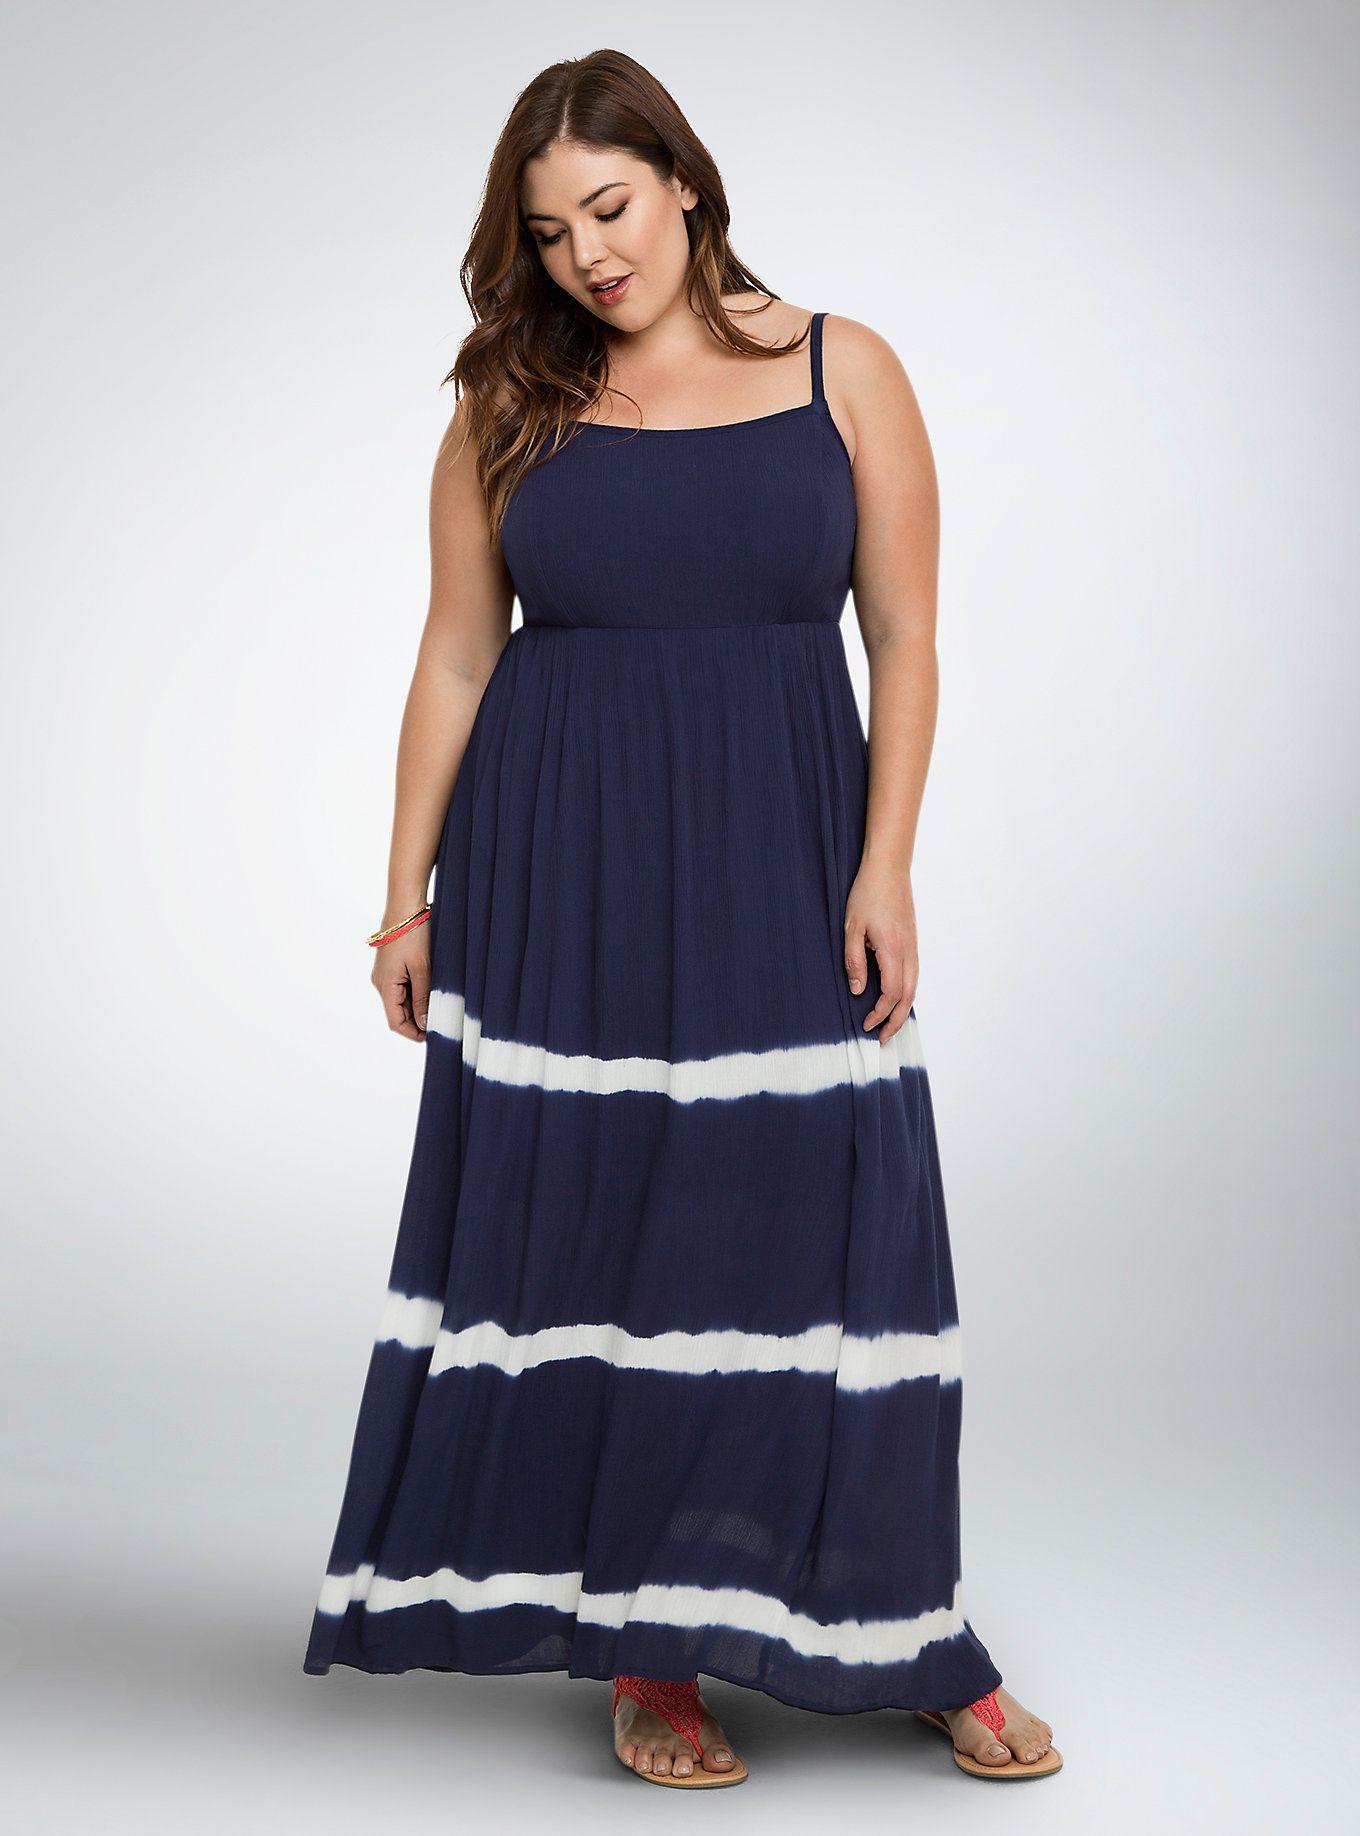 bc77edfd526 Tie Dye Gauze Maxi Dress. Tie Dye Gauze Maxi Dress Plus Size Summer ...